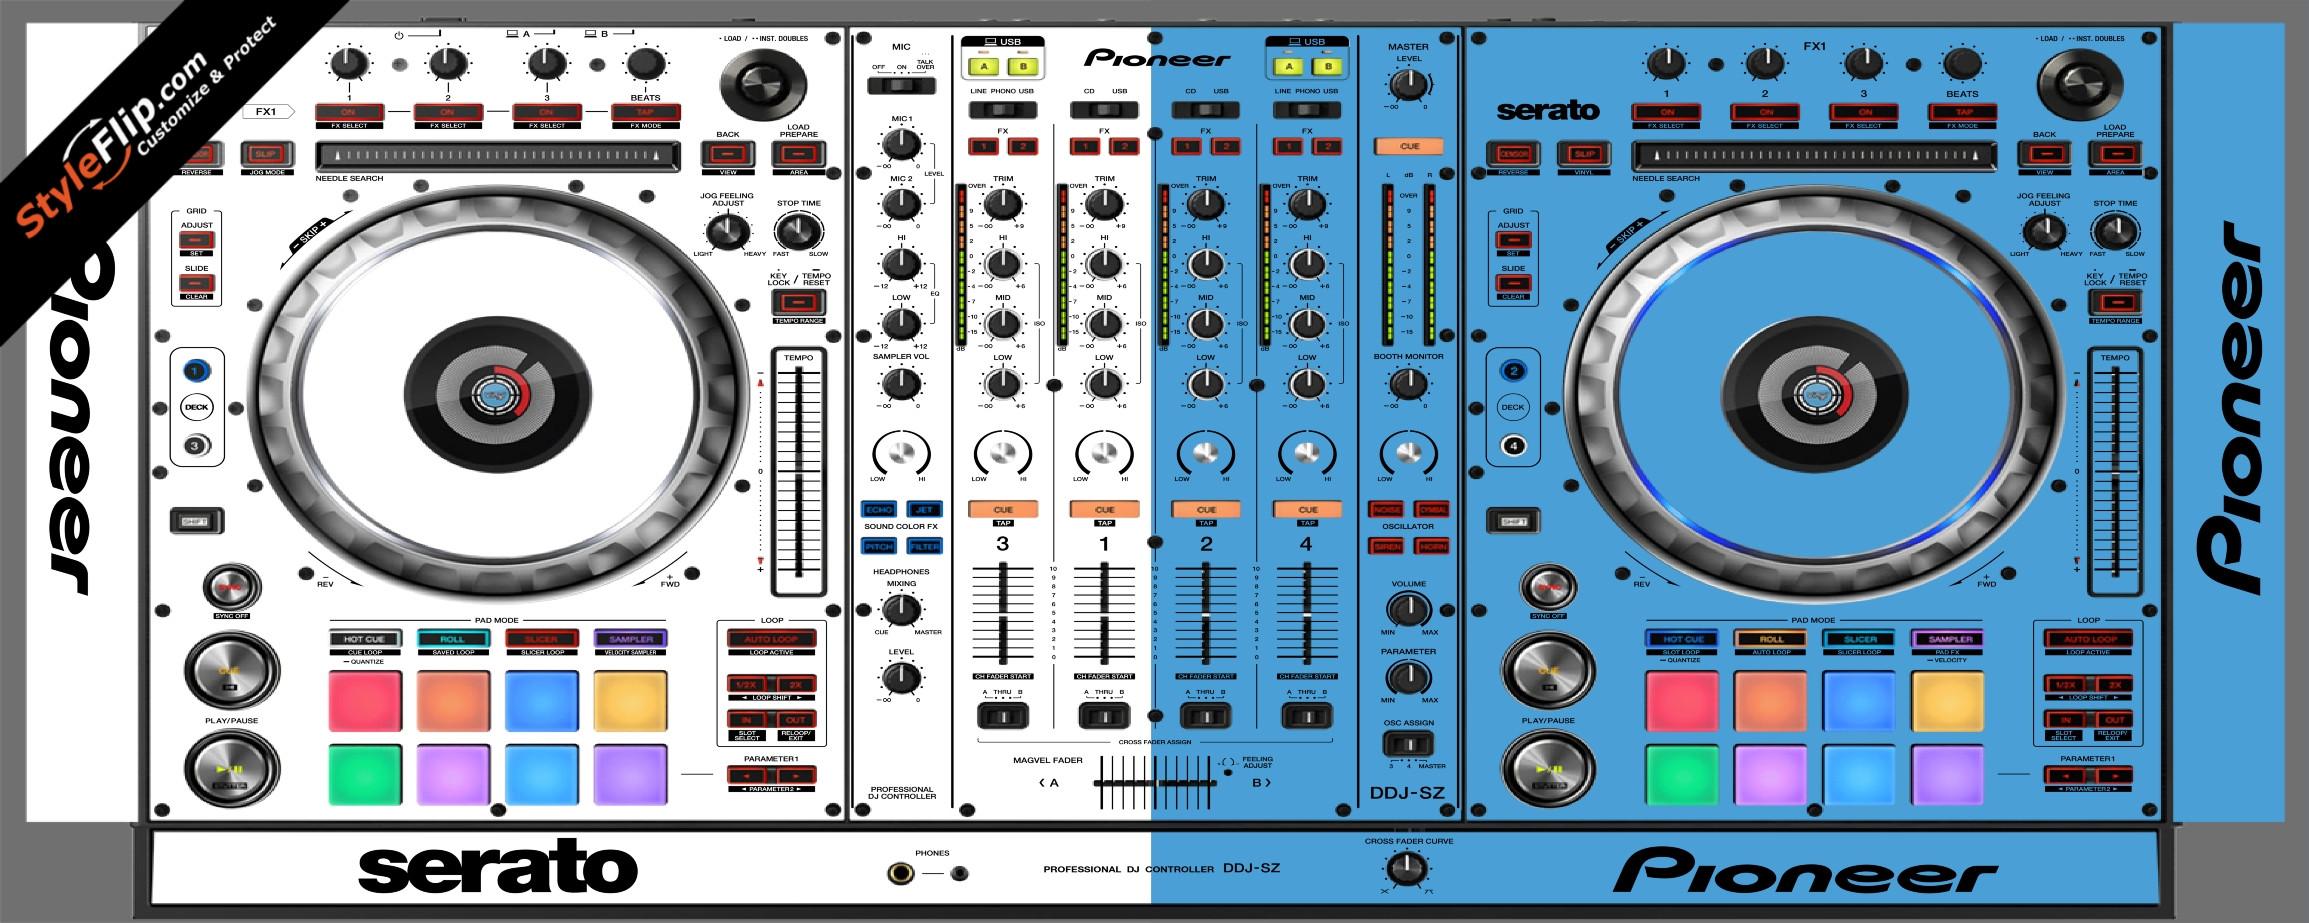 Blue & White Pioneer DDJ-SZ